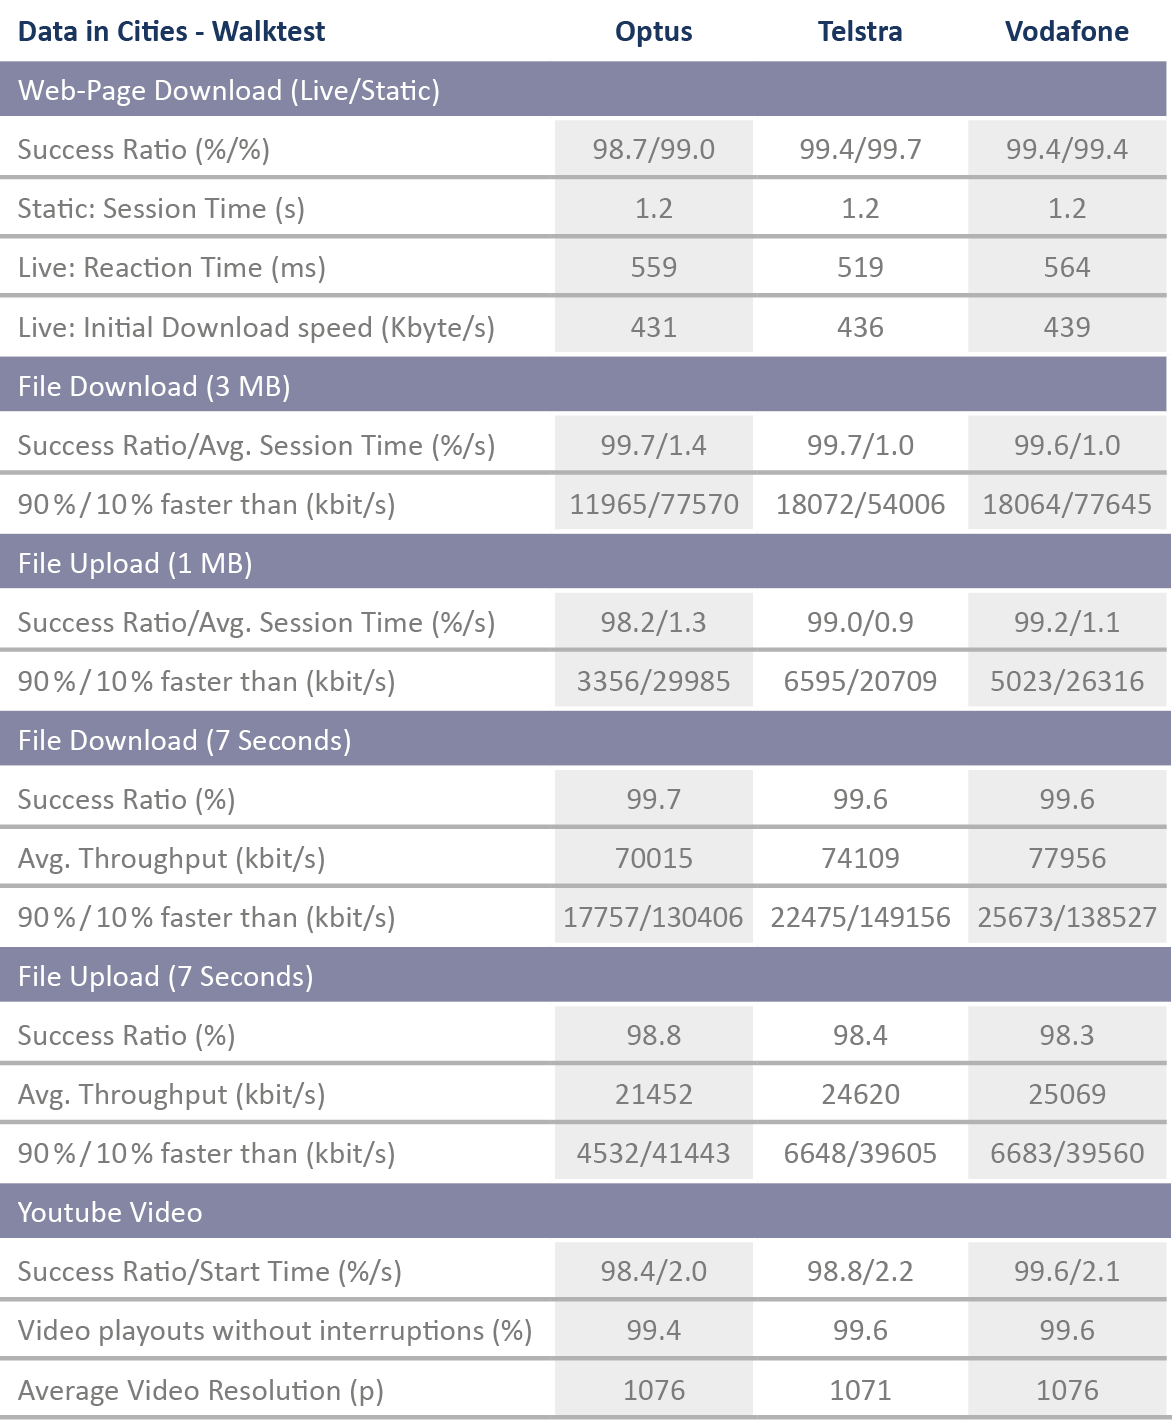 AUS_Tabelle_DataCitiesWalktest_Strich.png